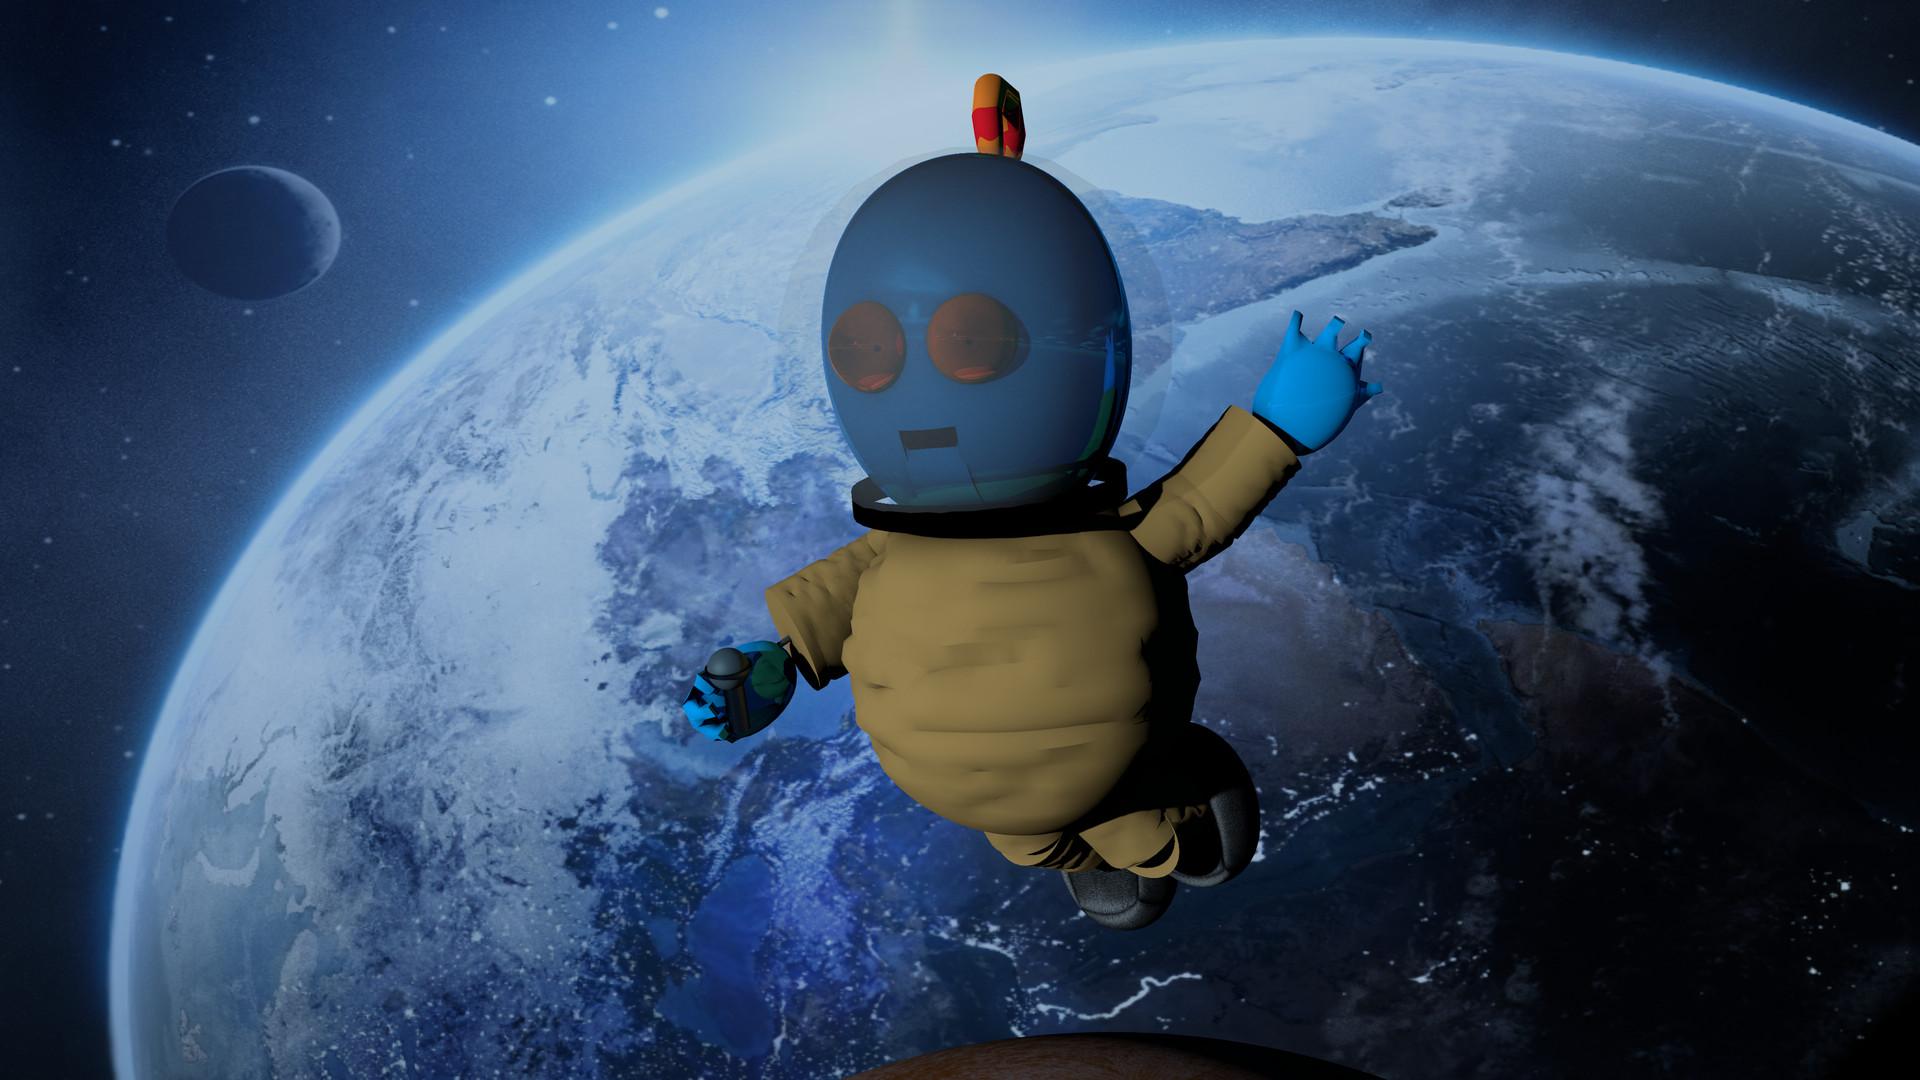 artstation - toy abe in space 4k wallpaper, ali el-khazali